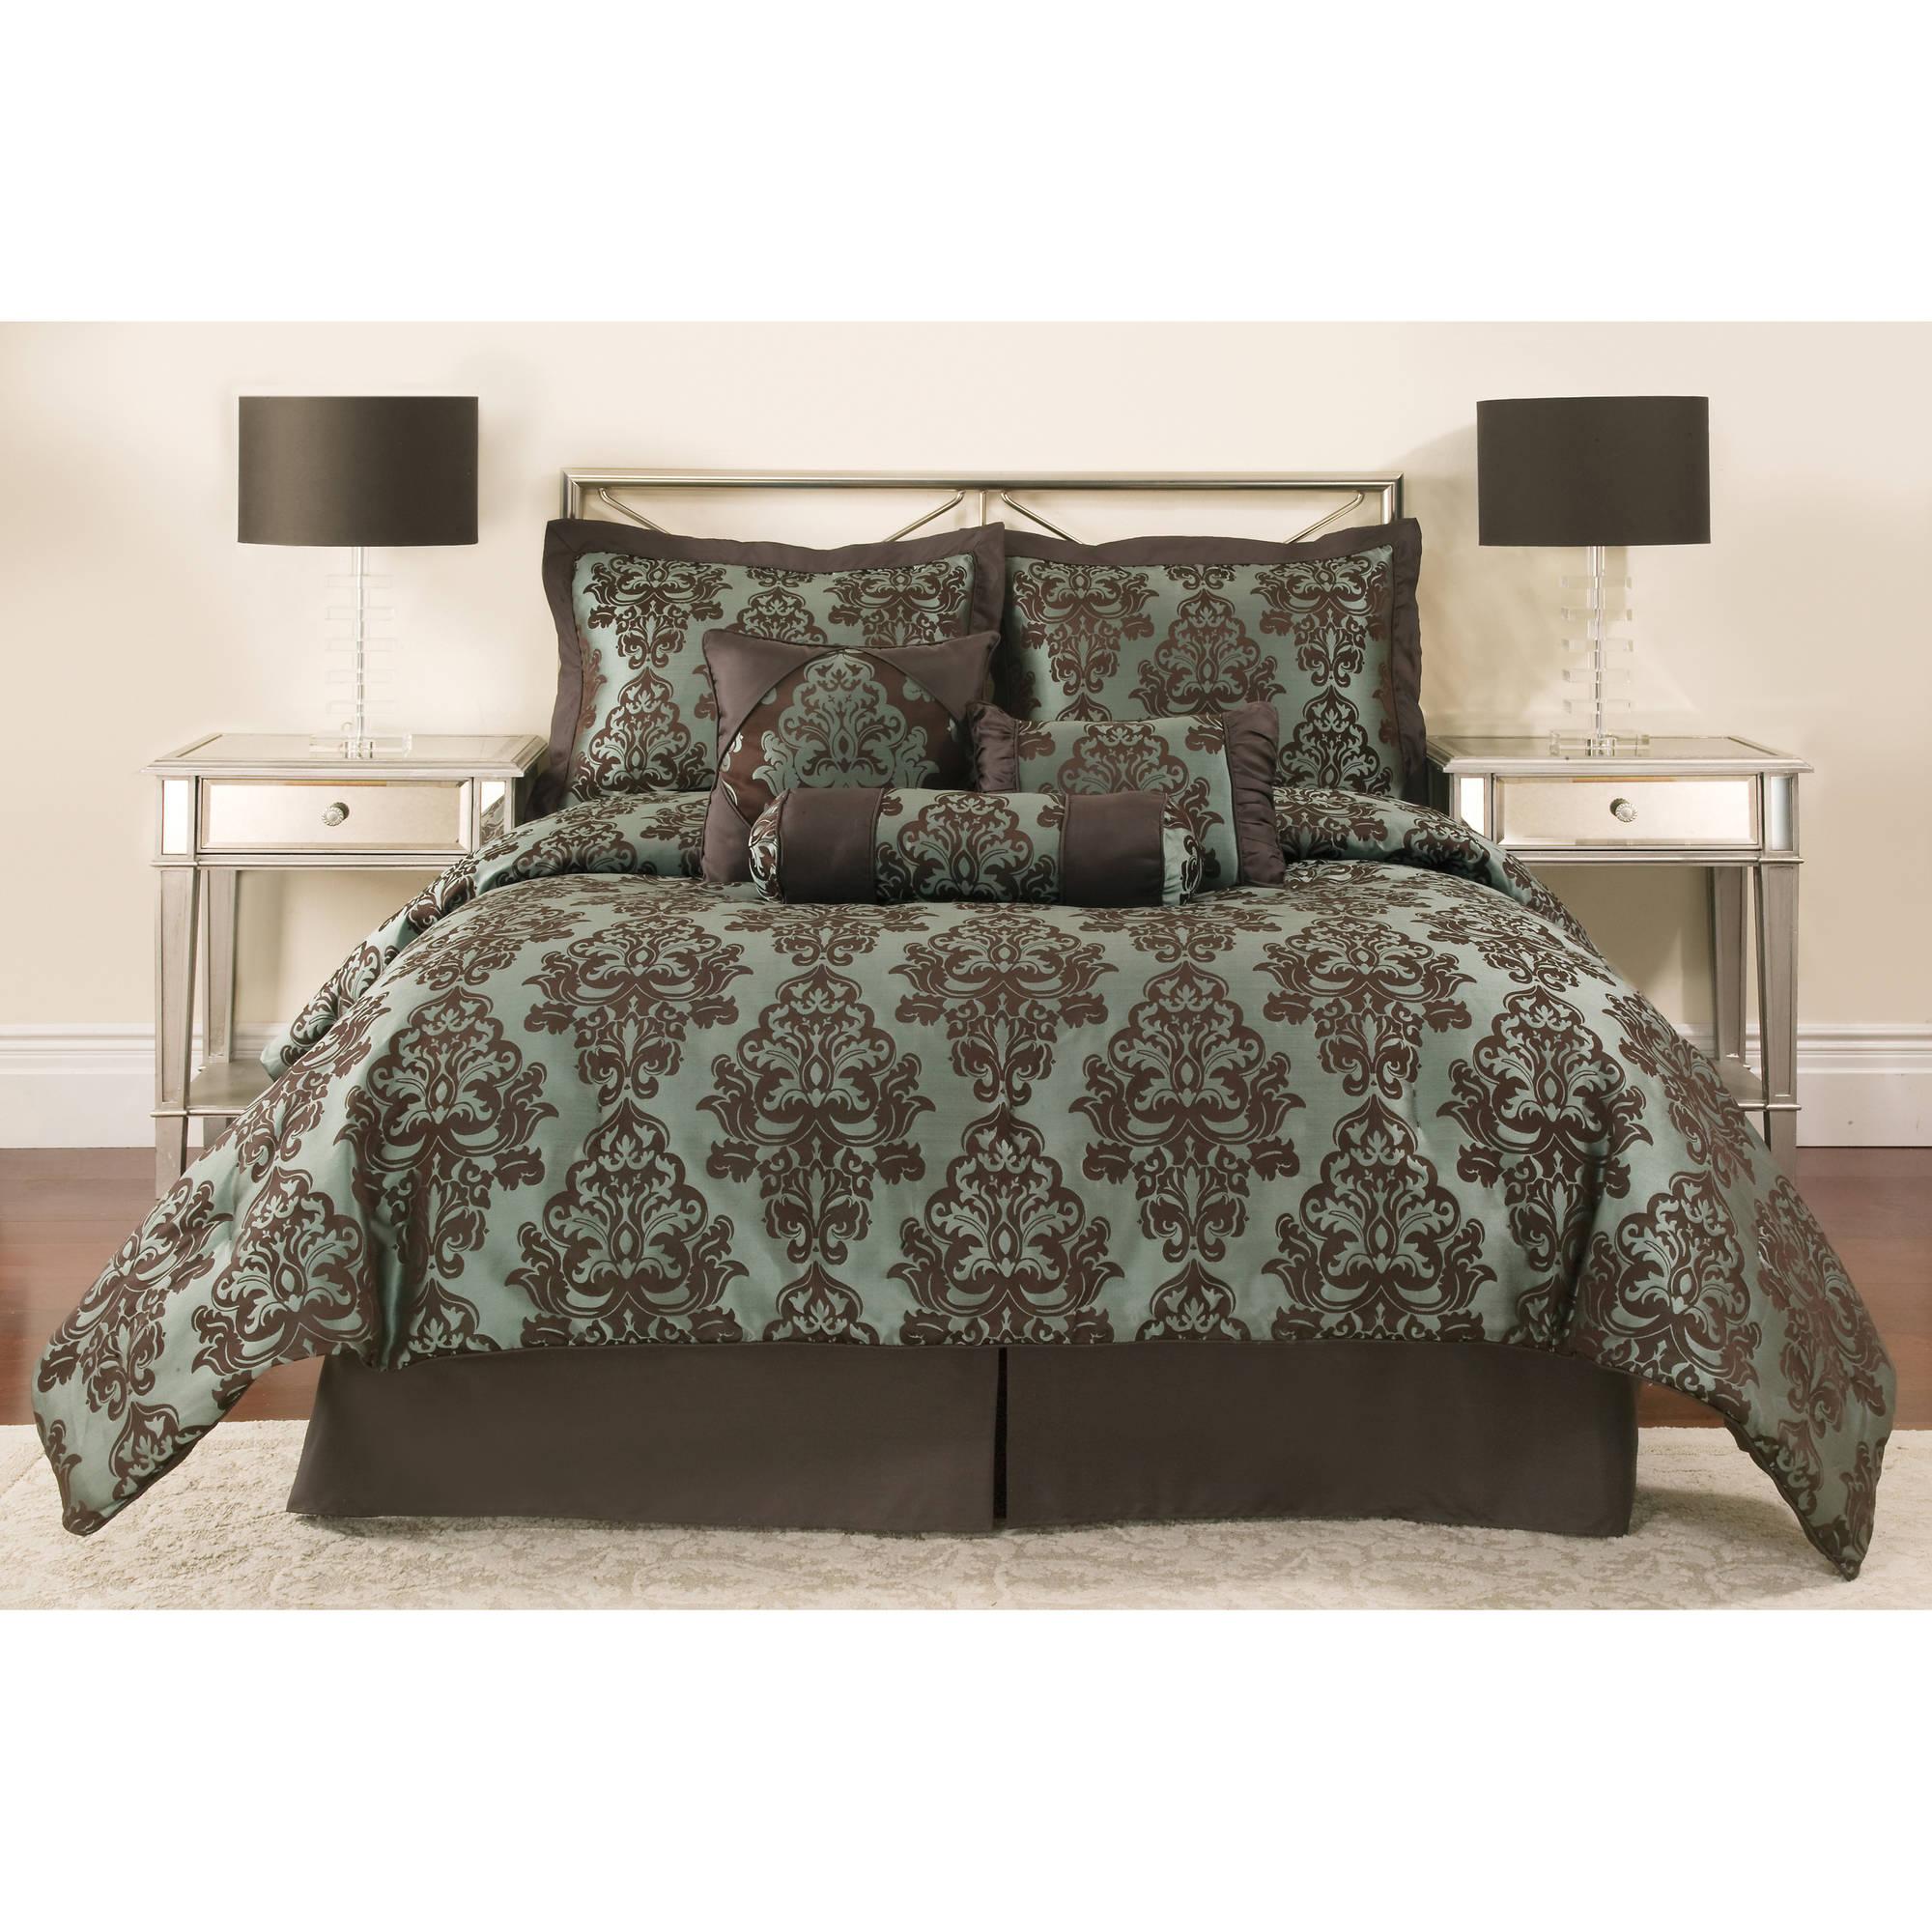 Mainstays 7 Piece Comforter Set, Dalton